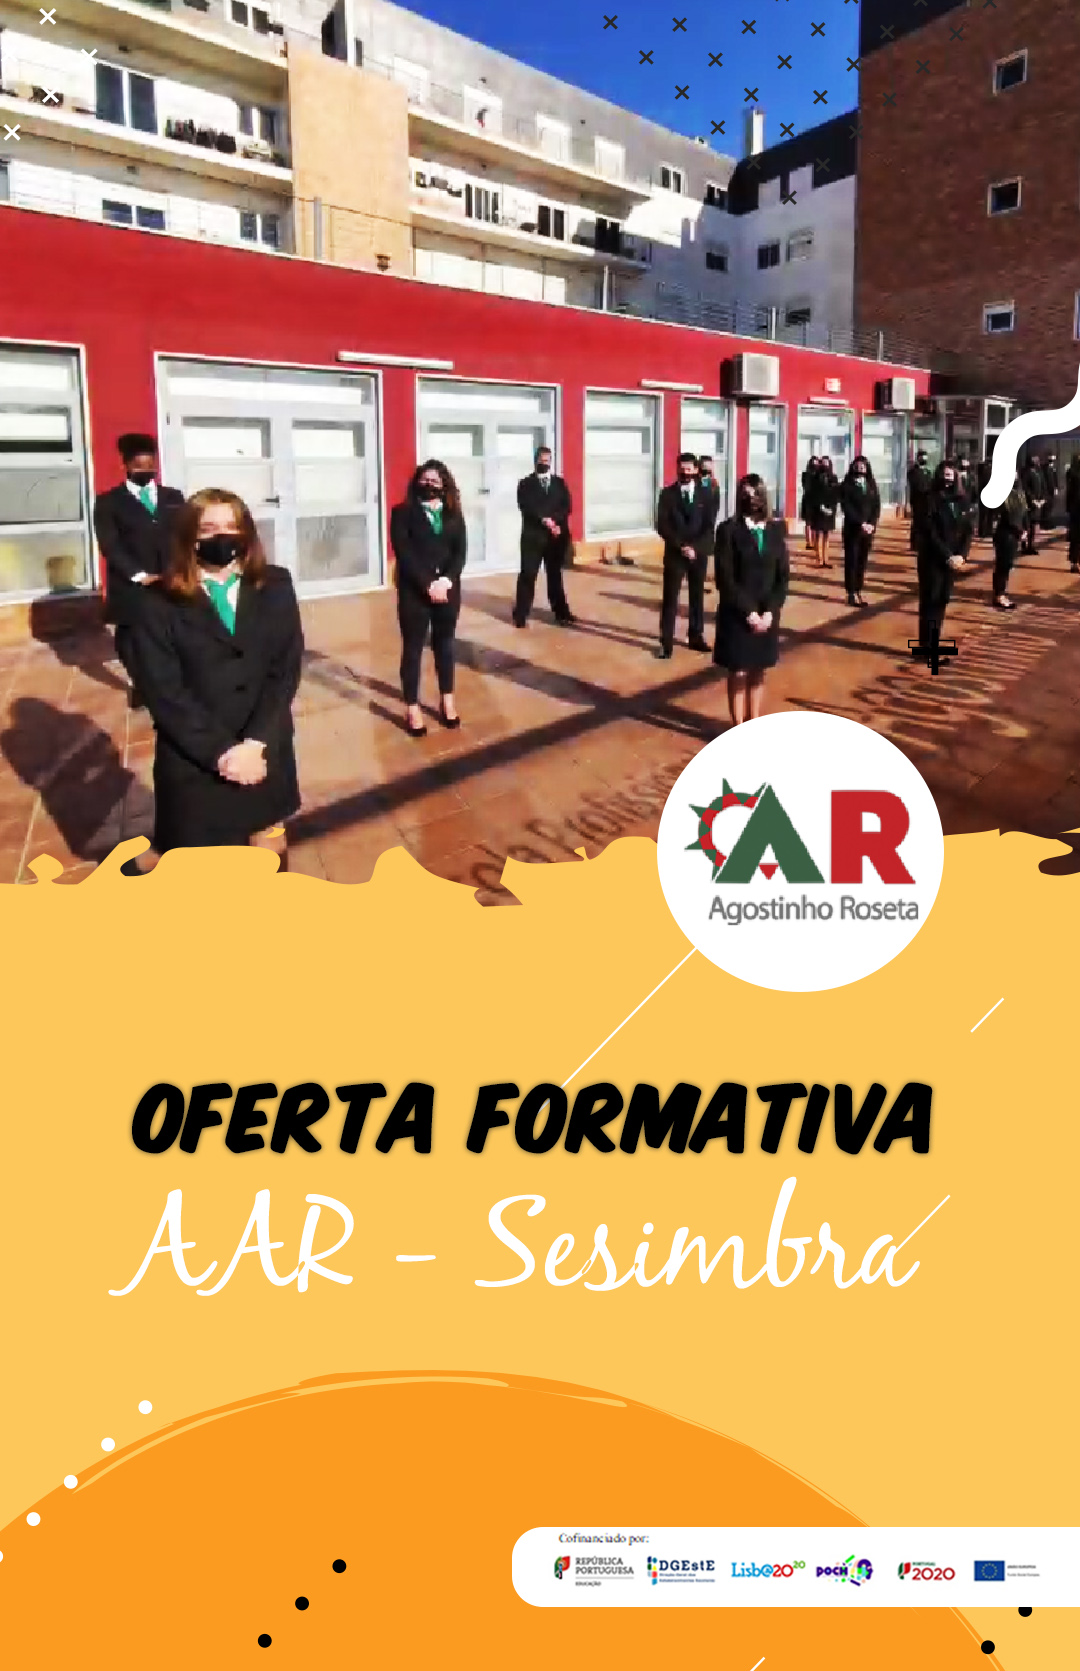 Oferta formativa _ Sesimbra